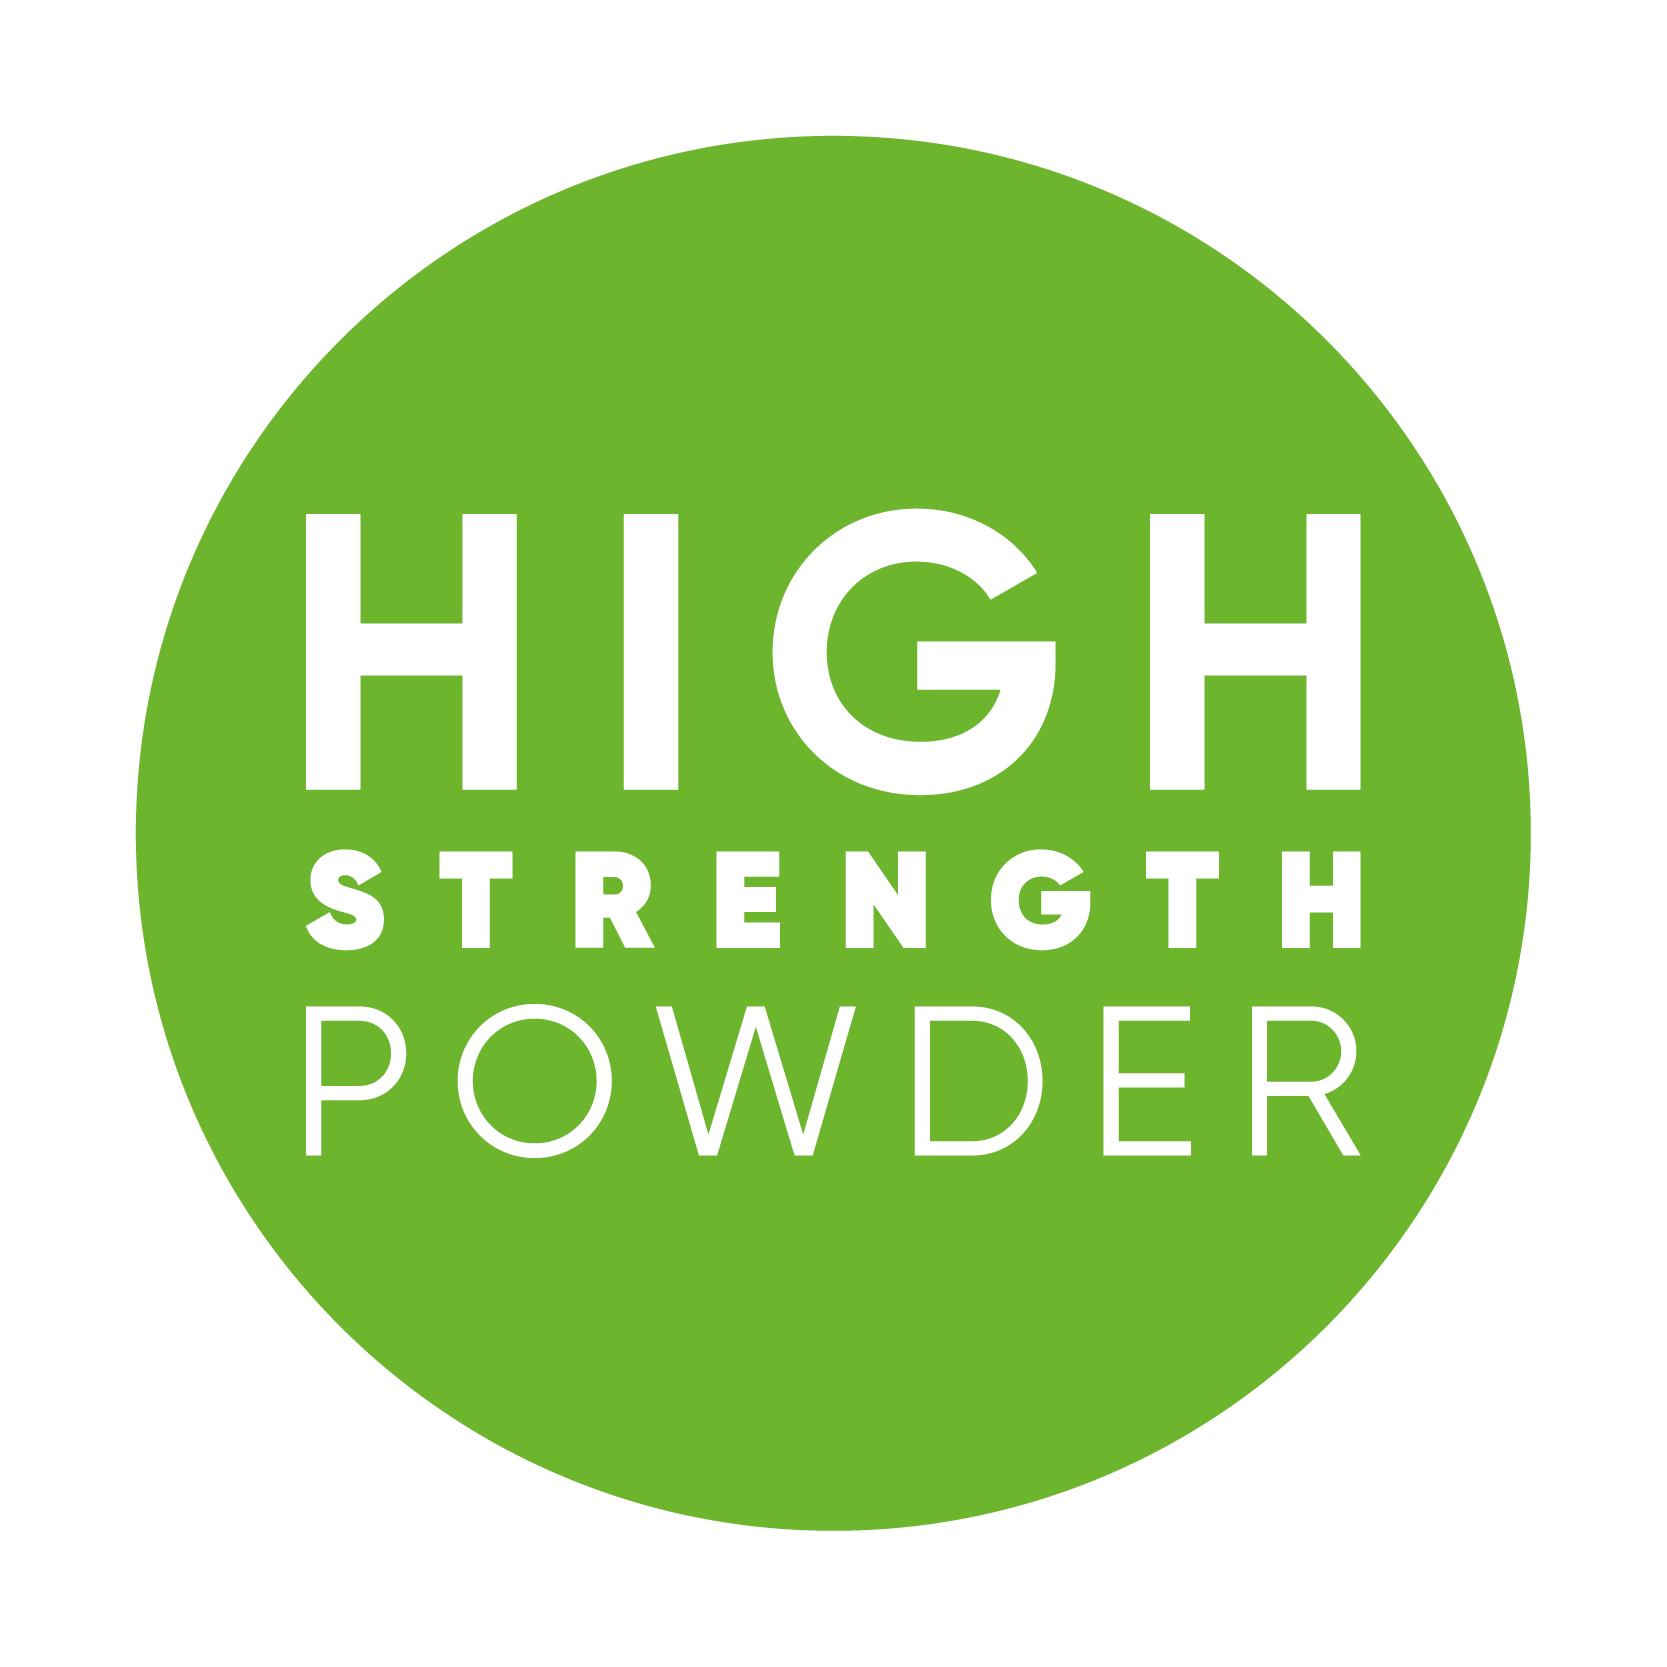 Ultra Potent Vitamin C Powder 232g (Approx. 122 Servings)